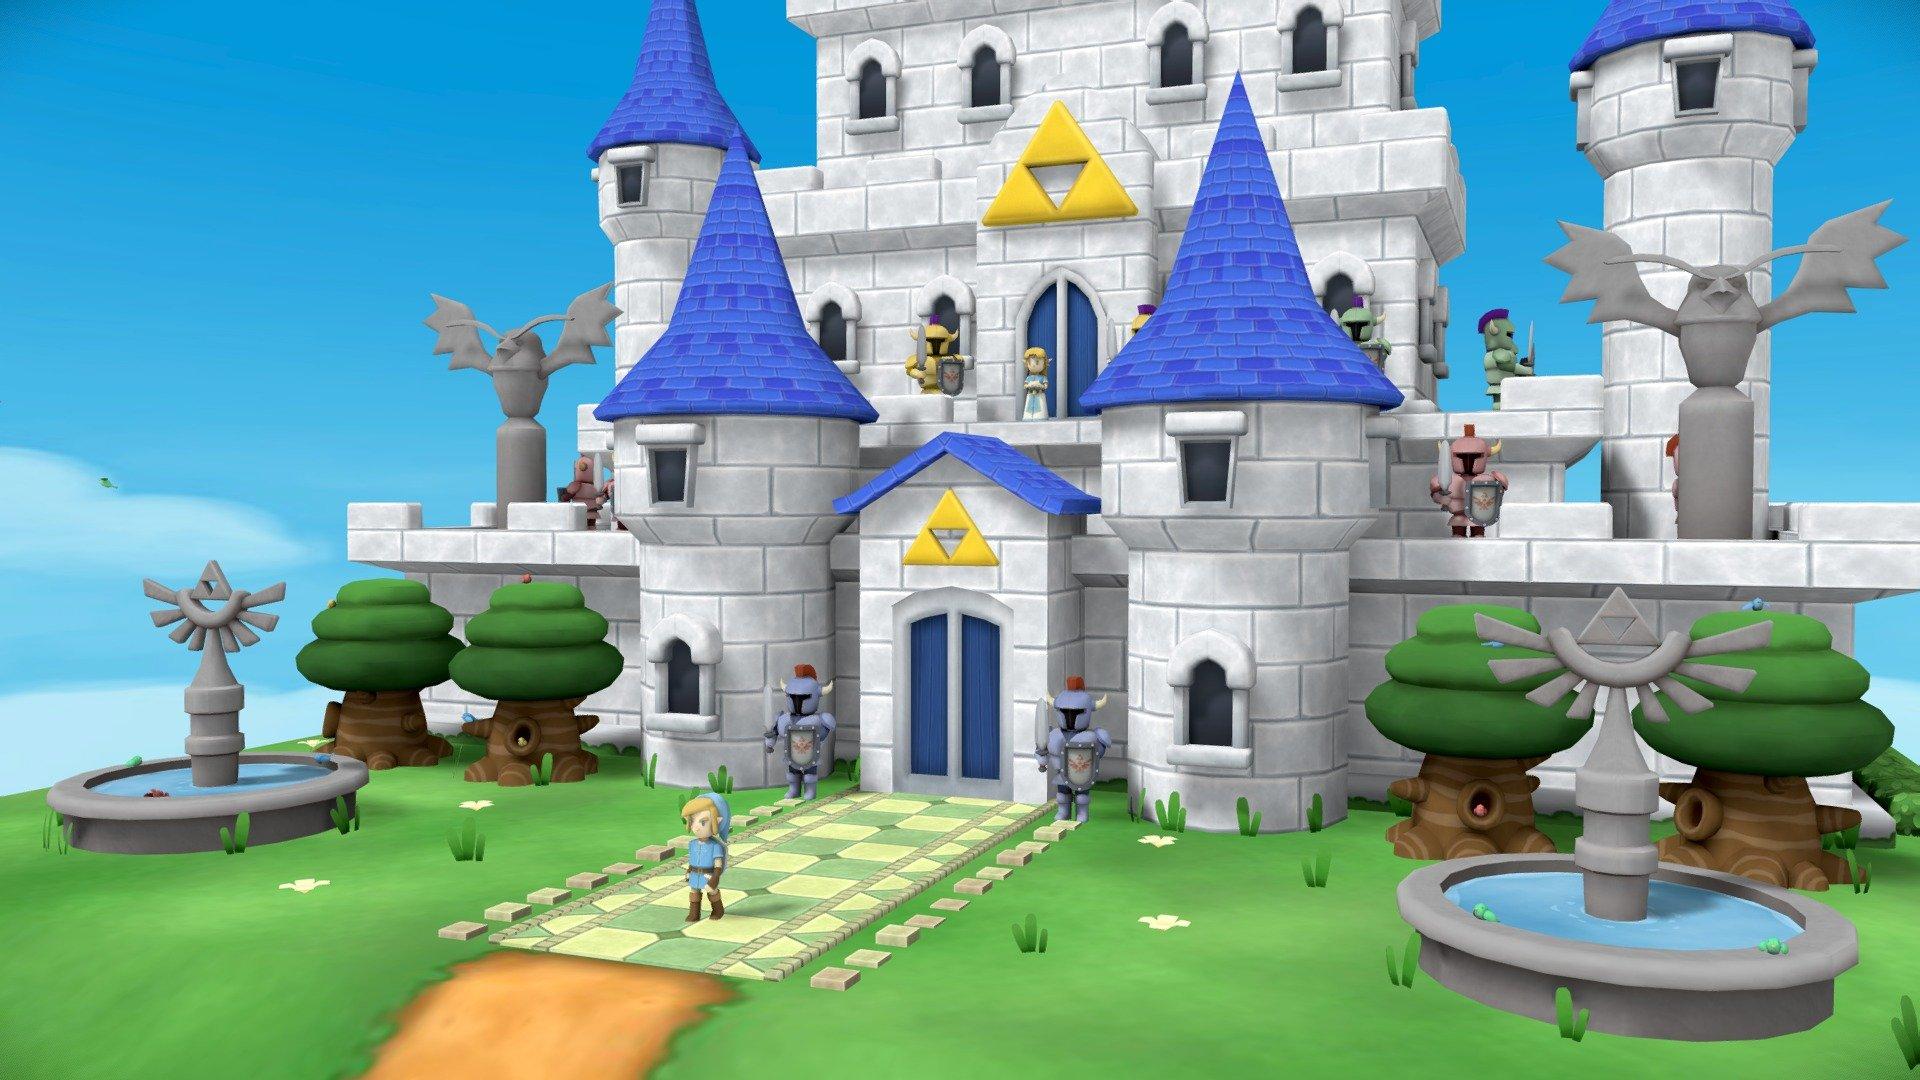 A Link To The Wild Hyrule Castle 3d Model By Chris Mendo Chris Mendo E6b2838 Sketchfab